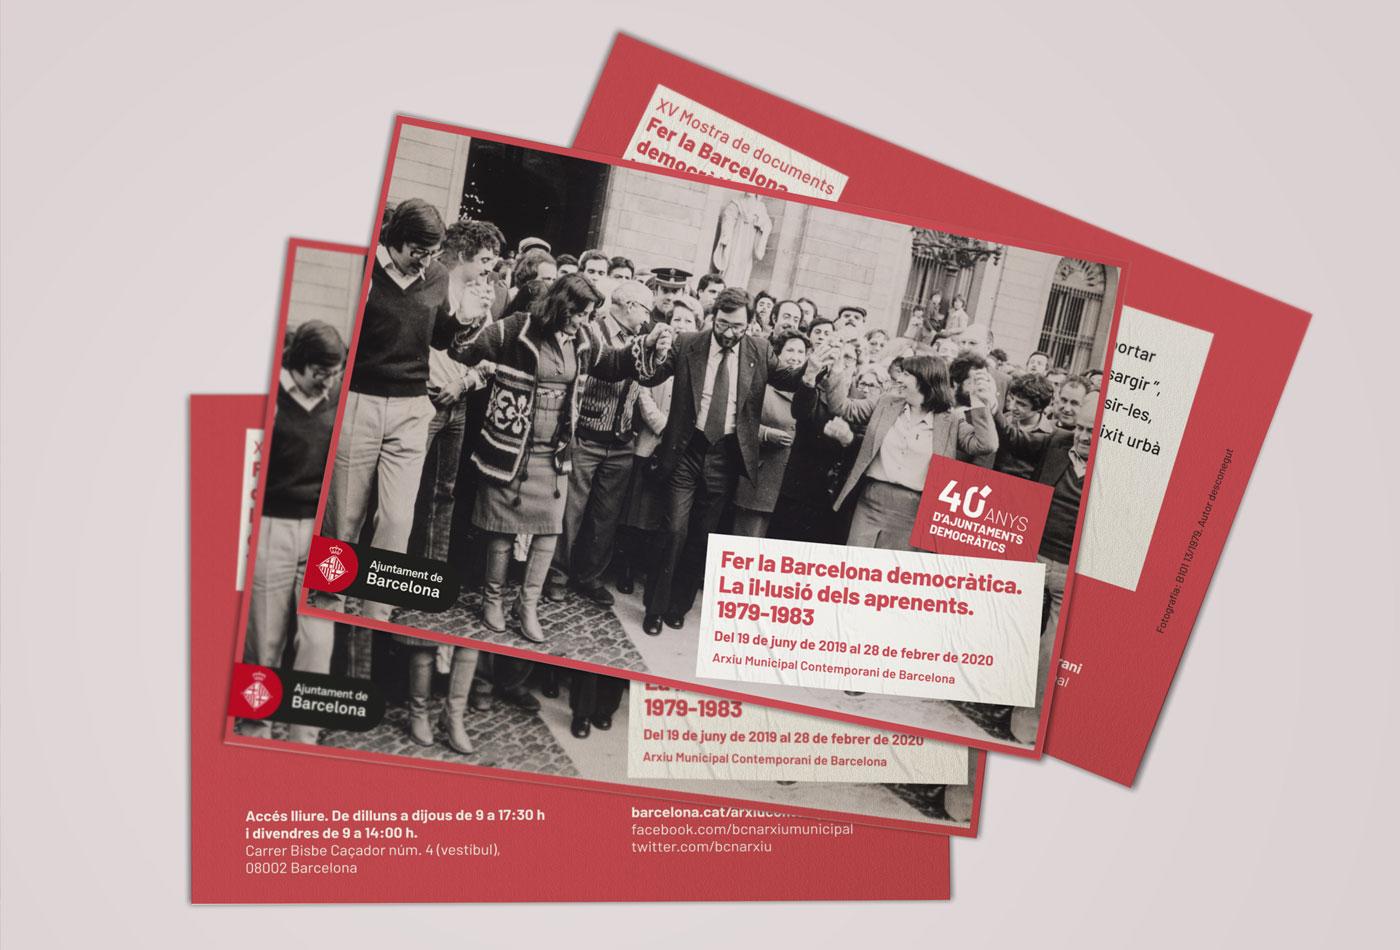 flyer-40anys-democracia-barcelona